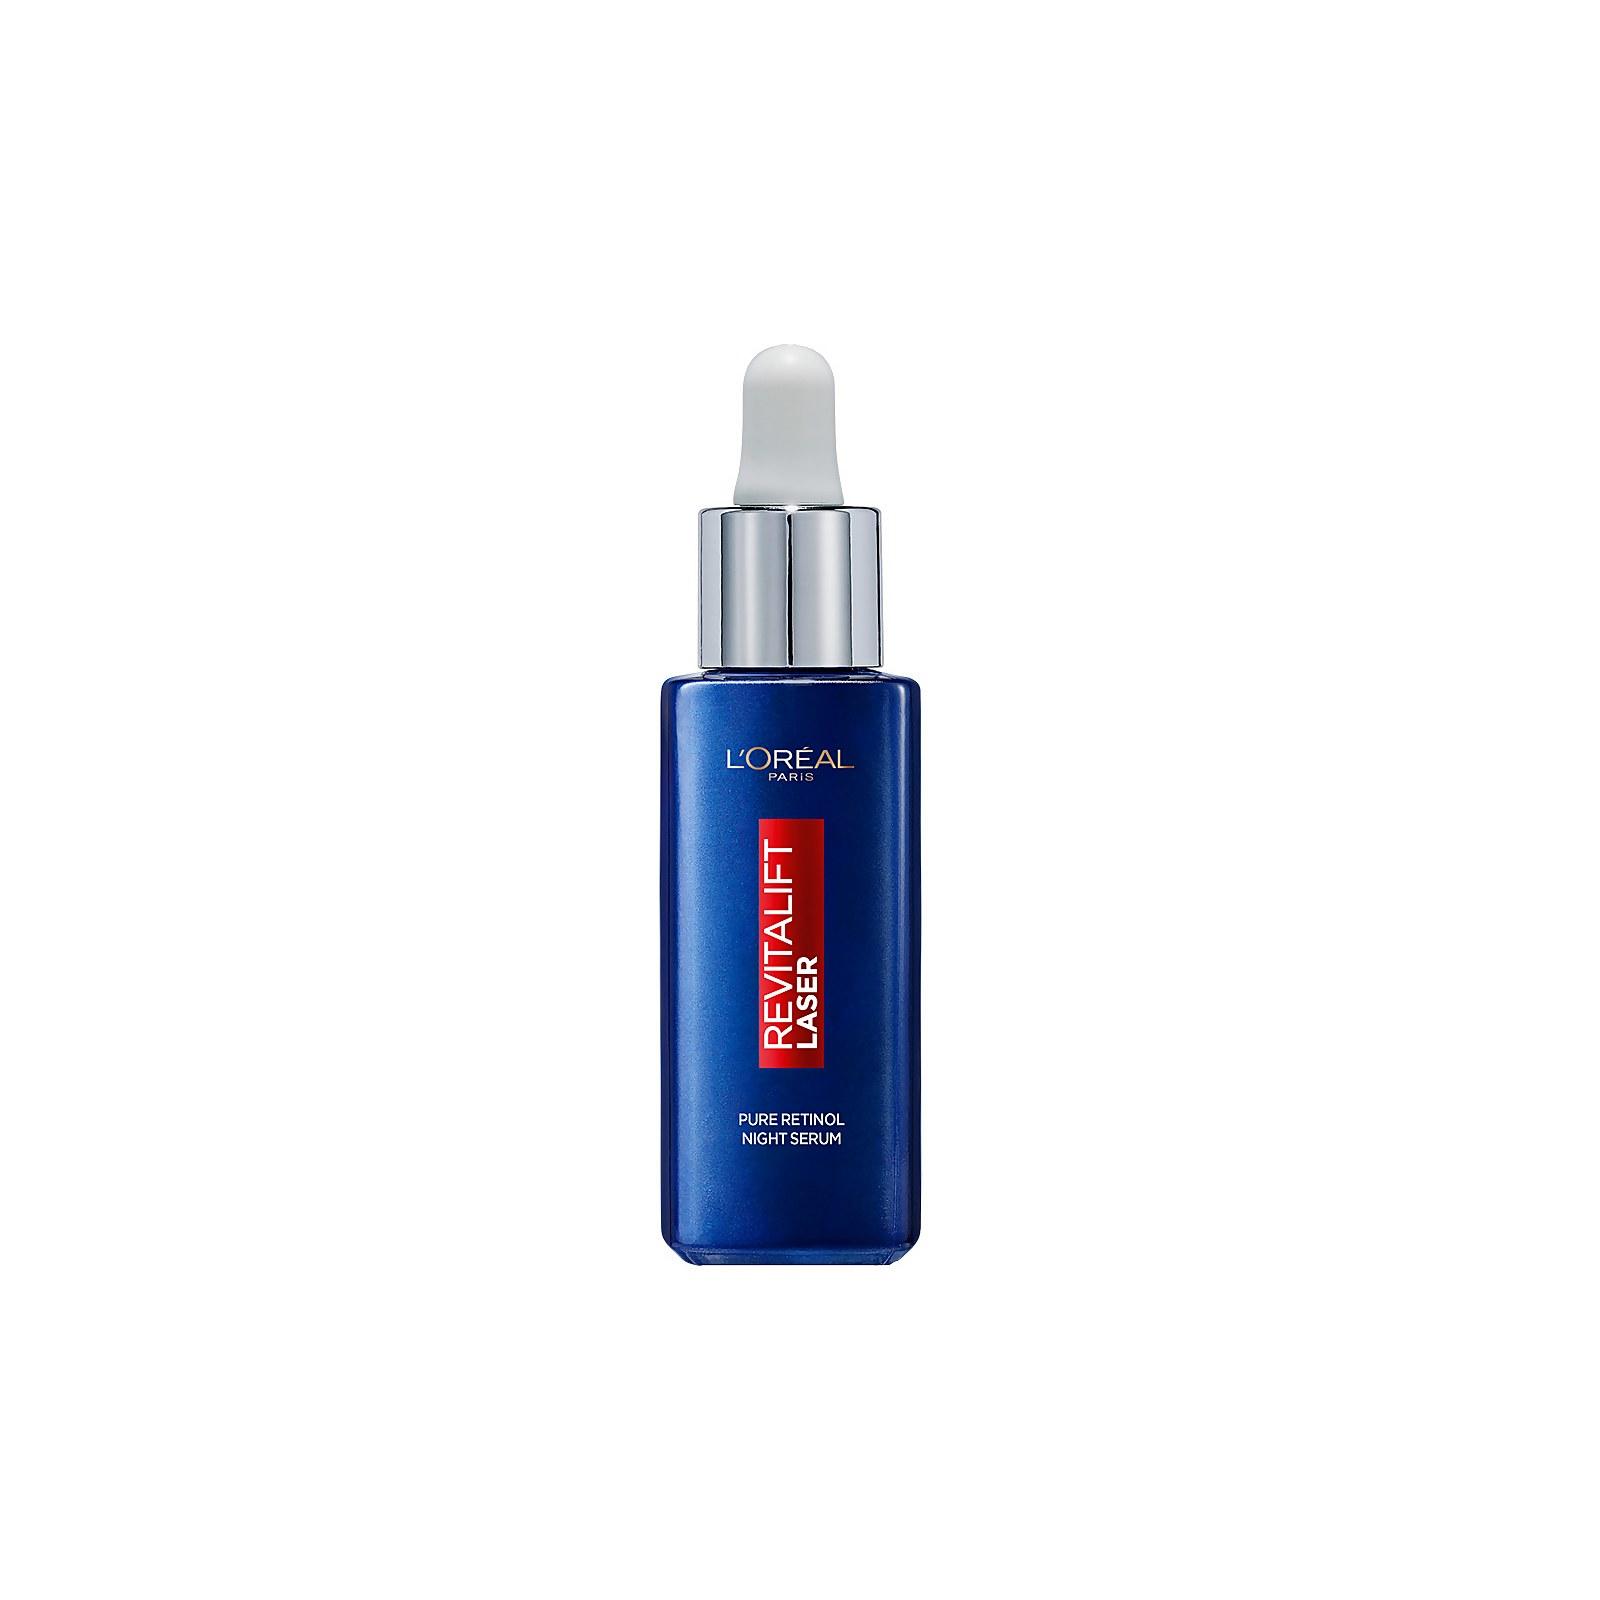 Купить L'Oréal Paris Revitalift Laser Pure Retinol Deep Anti-Wrinkle Night Serum 30ml